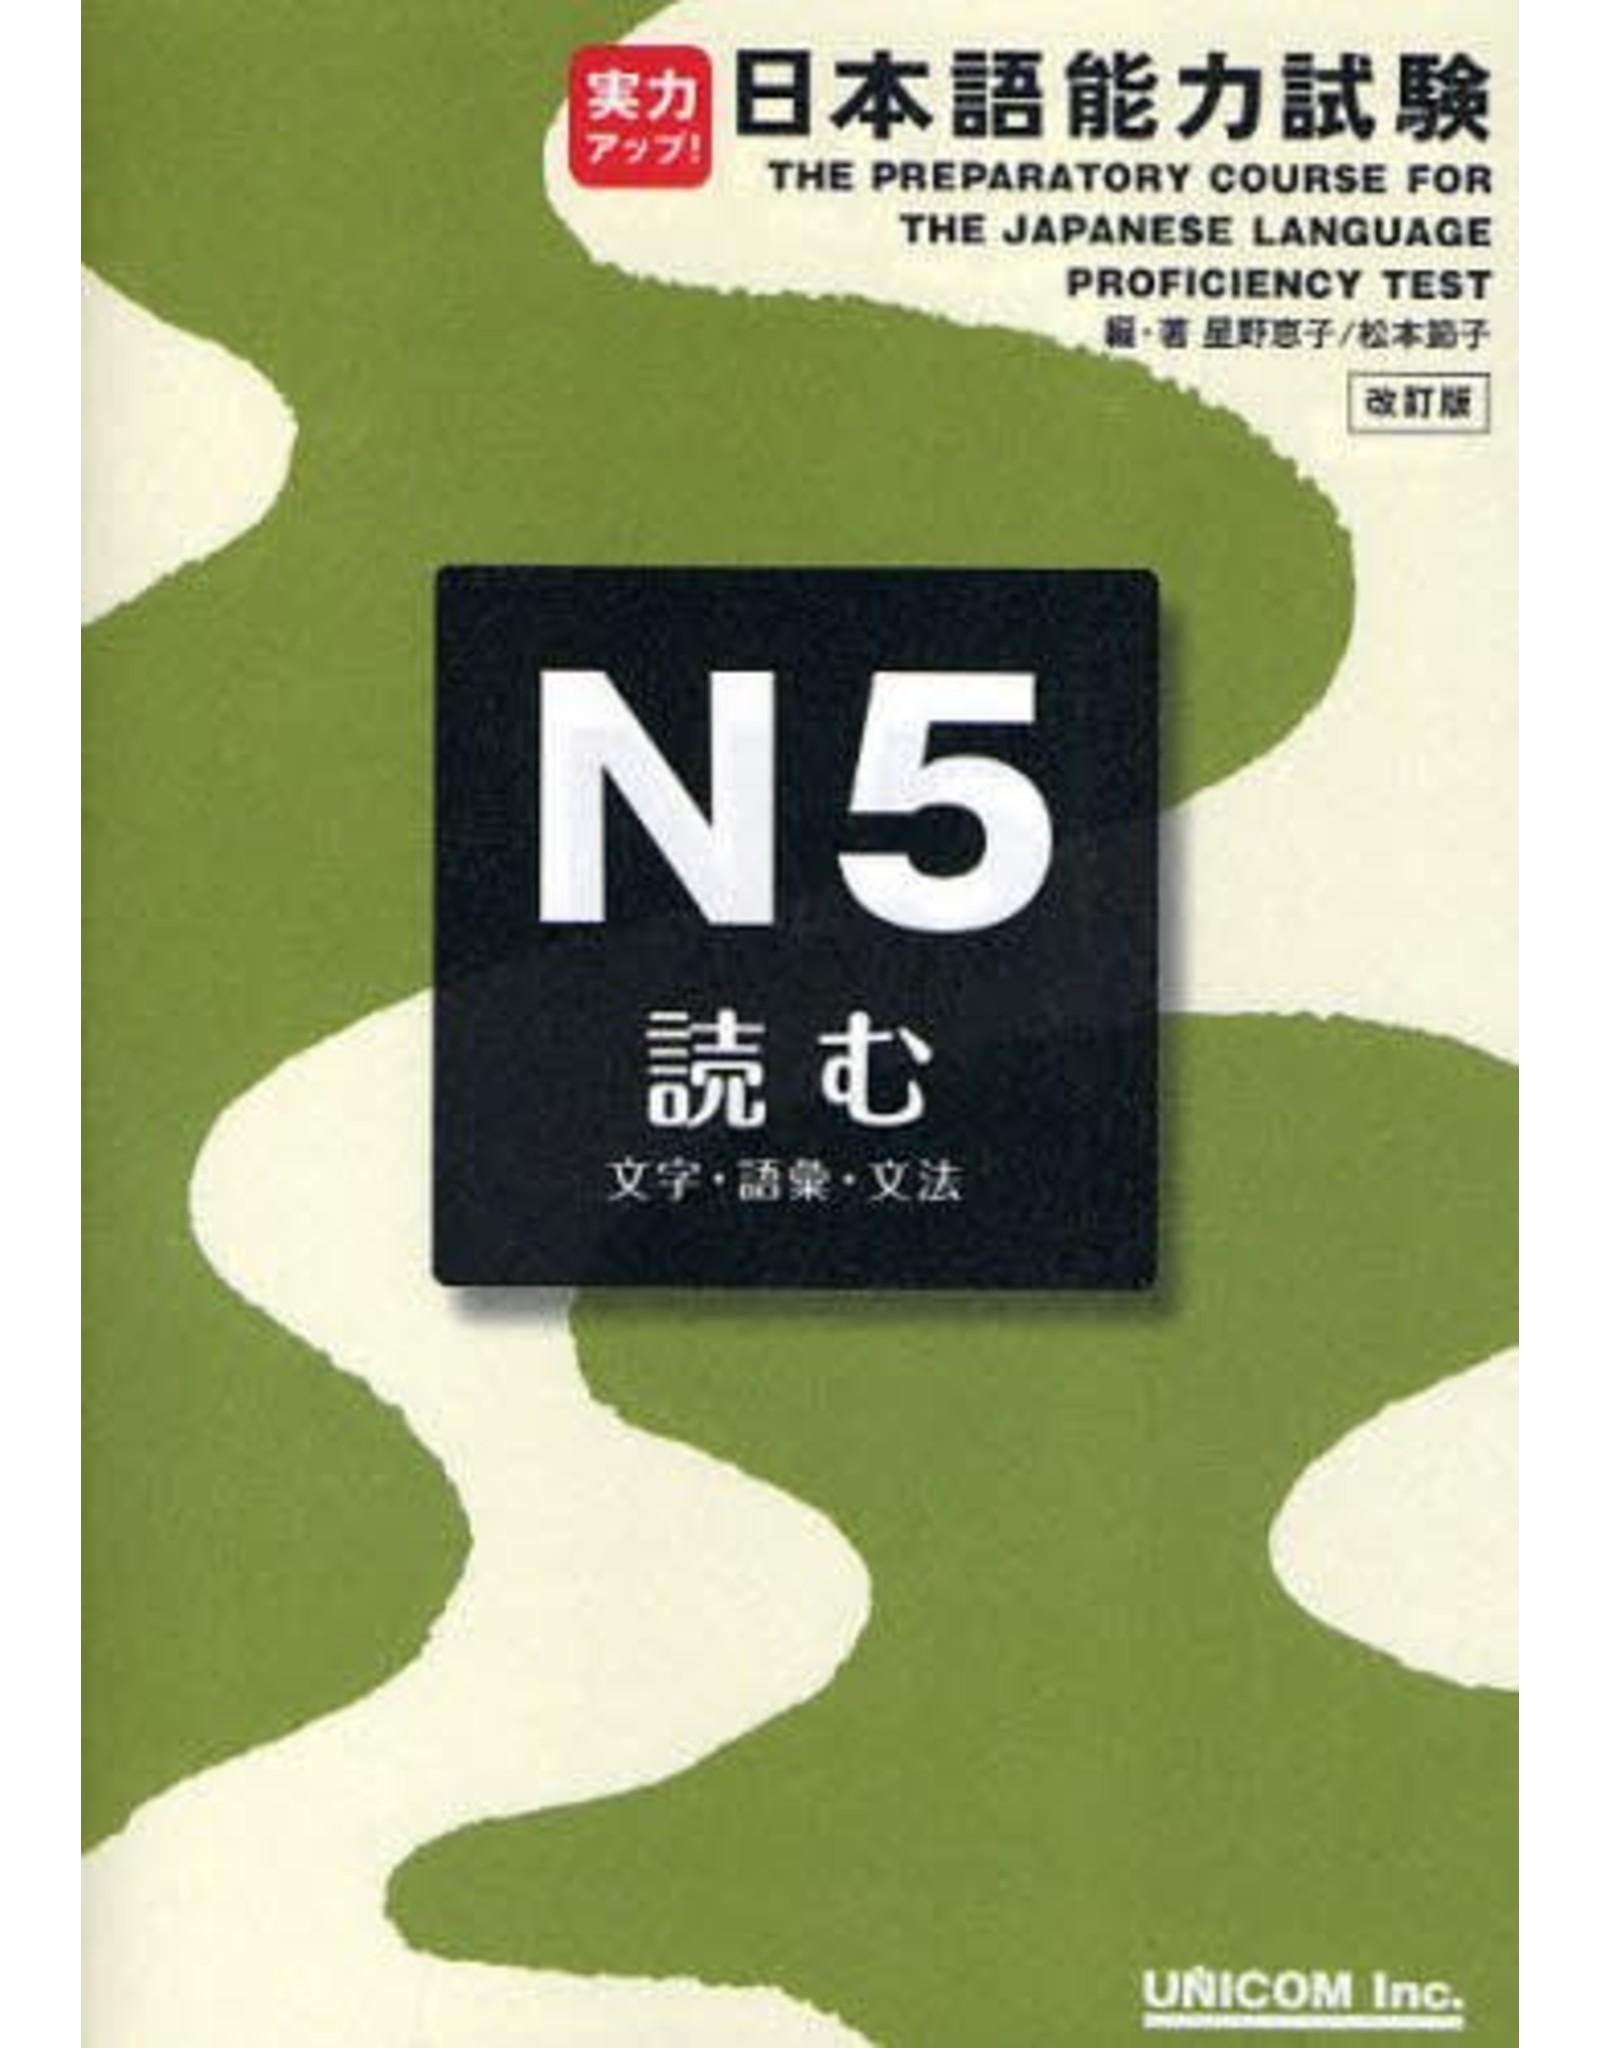 UNICOM THE PREPARATORY COURSE FOR THE JLPT N5 YOMU MOJI/GOI/BUNPO